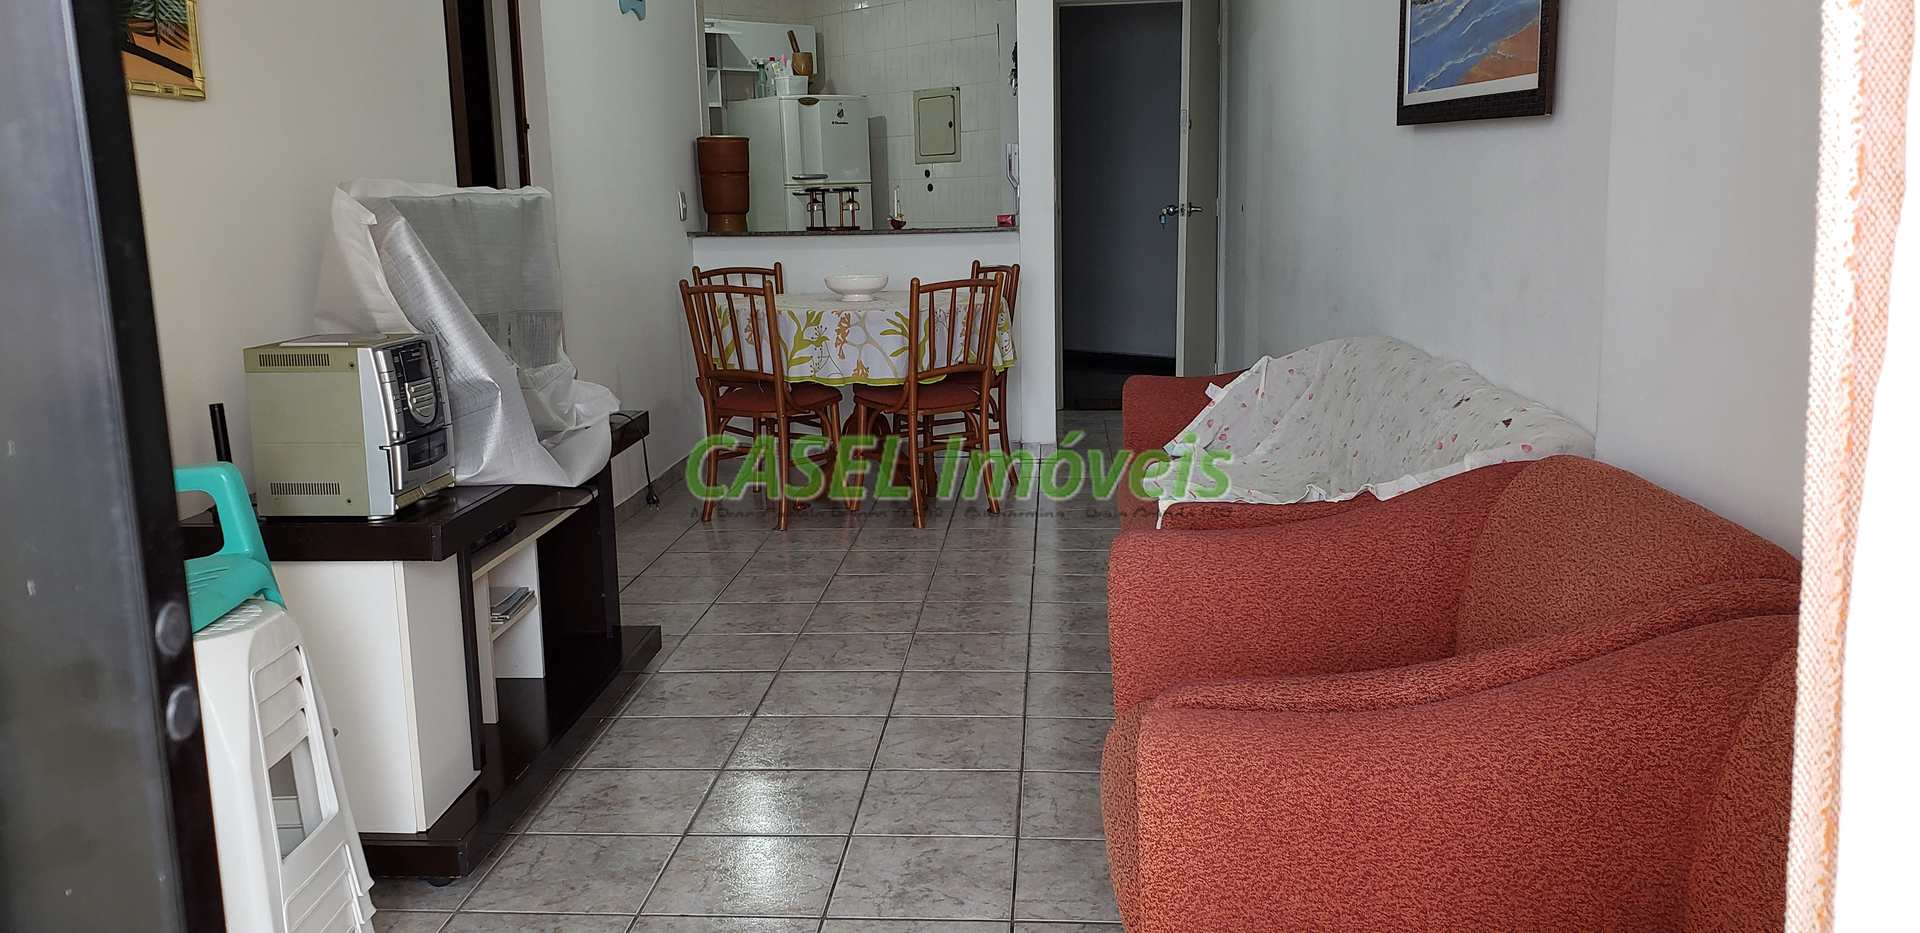 Linda Vista p/ o Mar, 2 Dormitórios Só R$ 250 mil, Cod: 803978